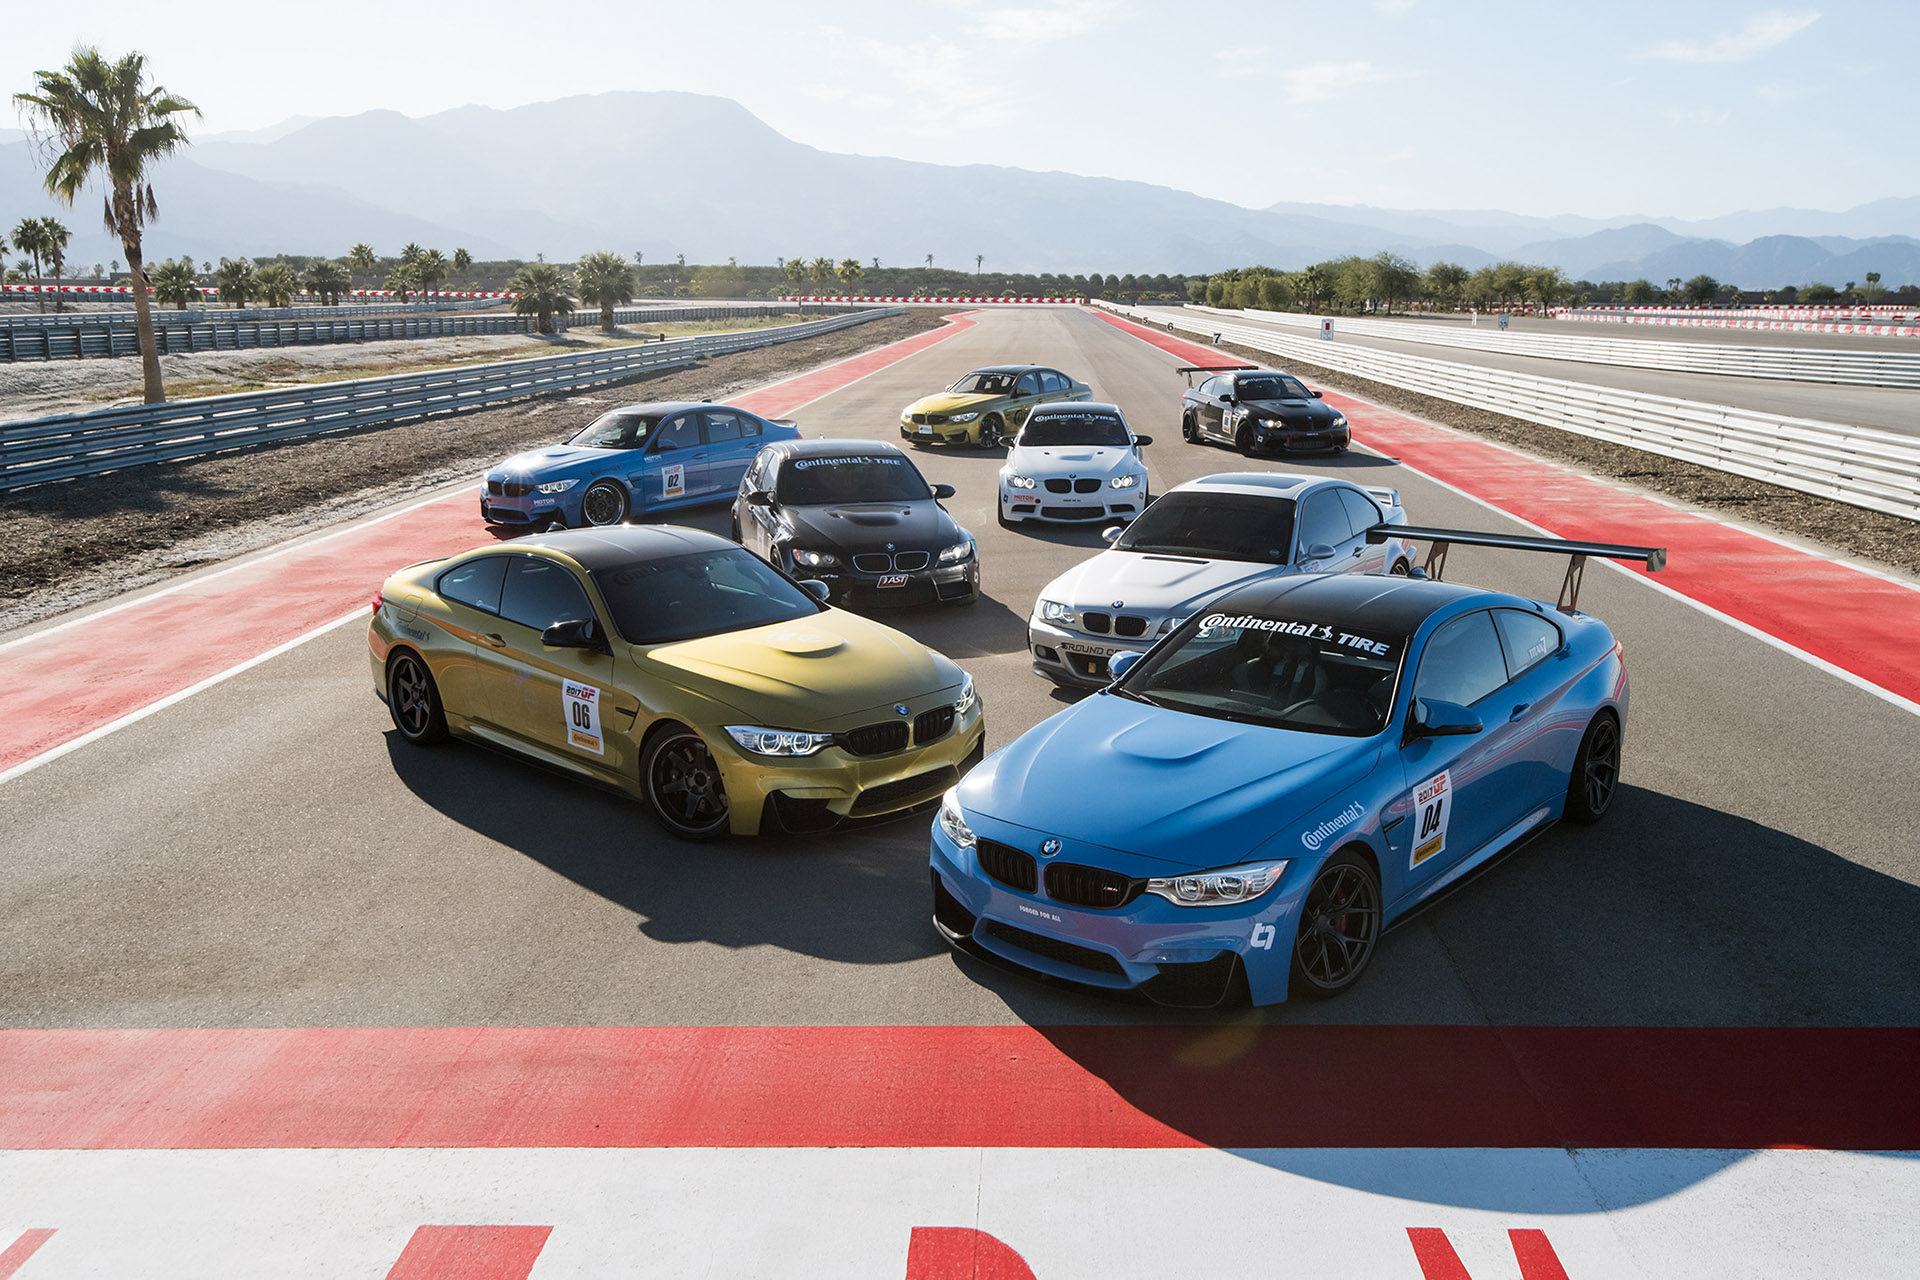 Luke Munnell motorsports photography European Car magazine Tuner GP BMW group shot at Thermal Club raceway